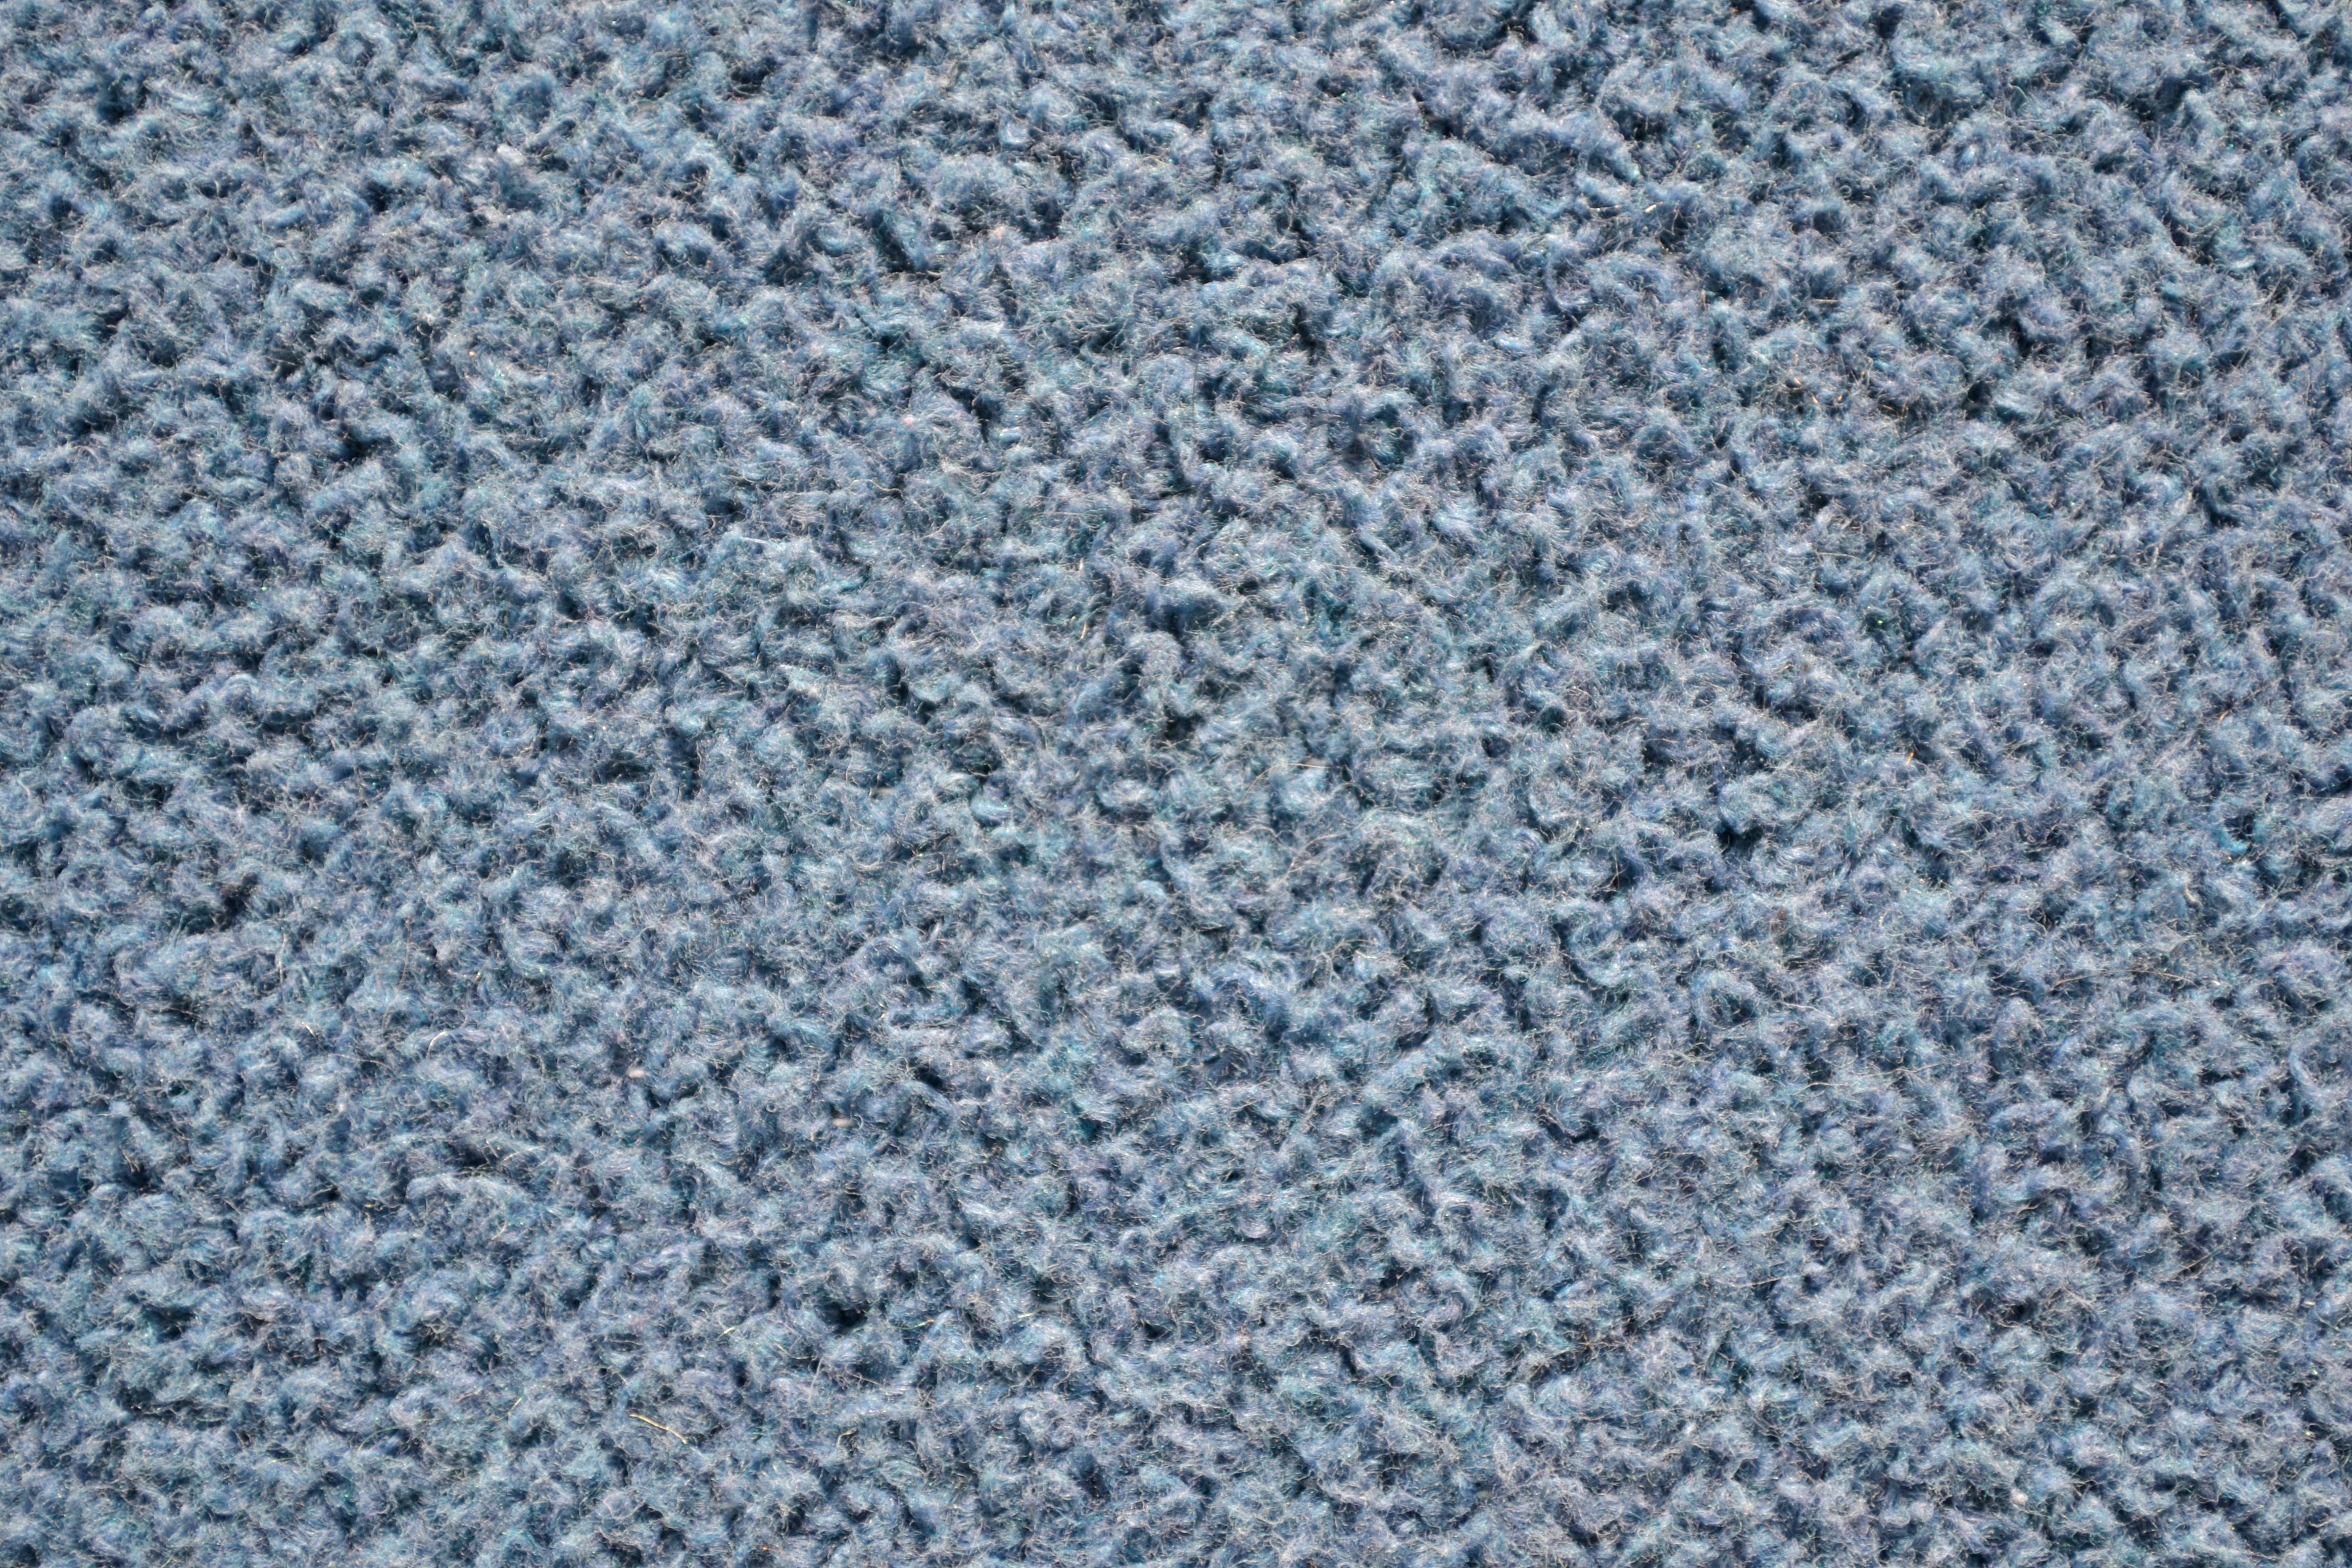 floor, asphalt, soil, material, textile